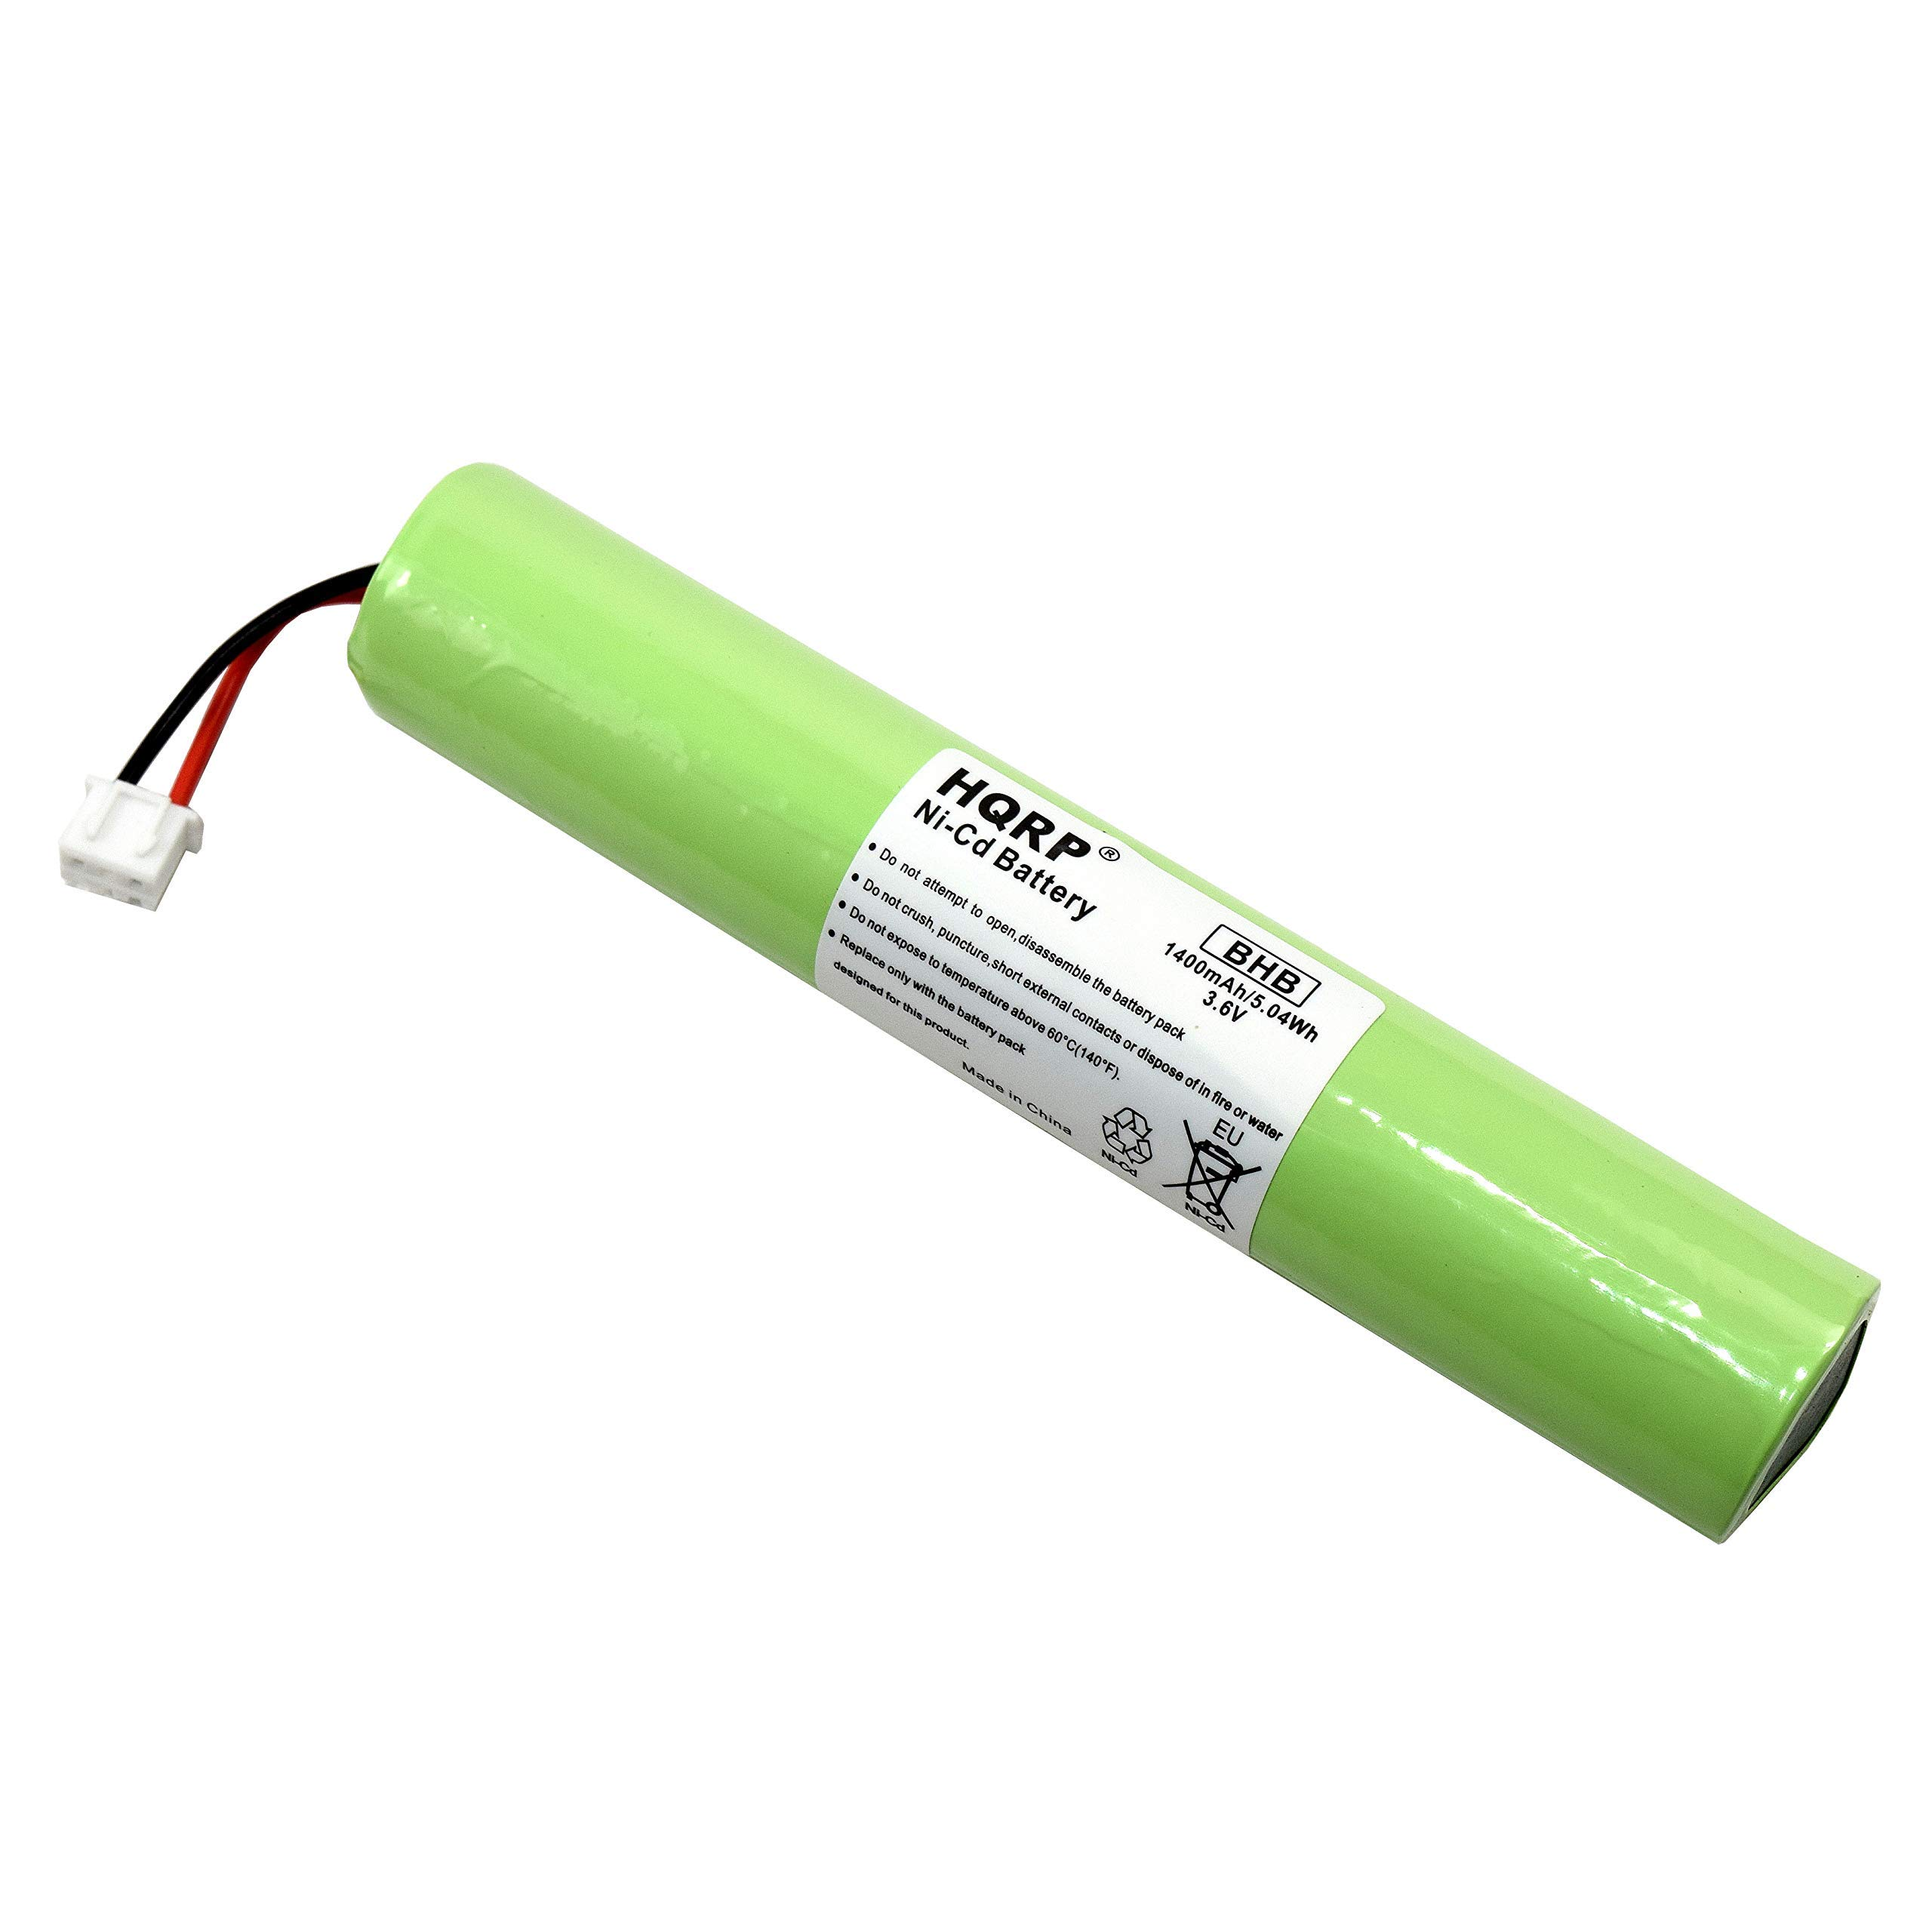 Bateria Para Hurricane Spin Scrubber Brush Cleaner Mop Spin-